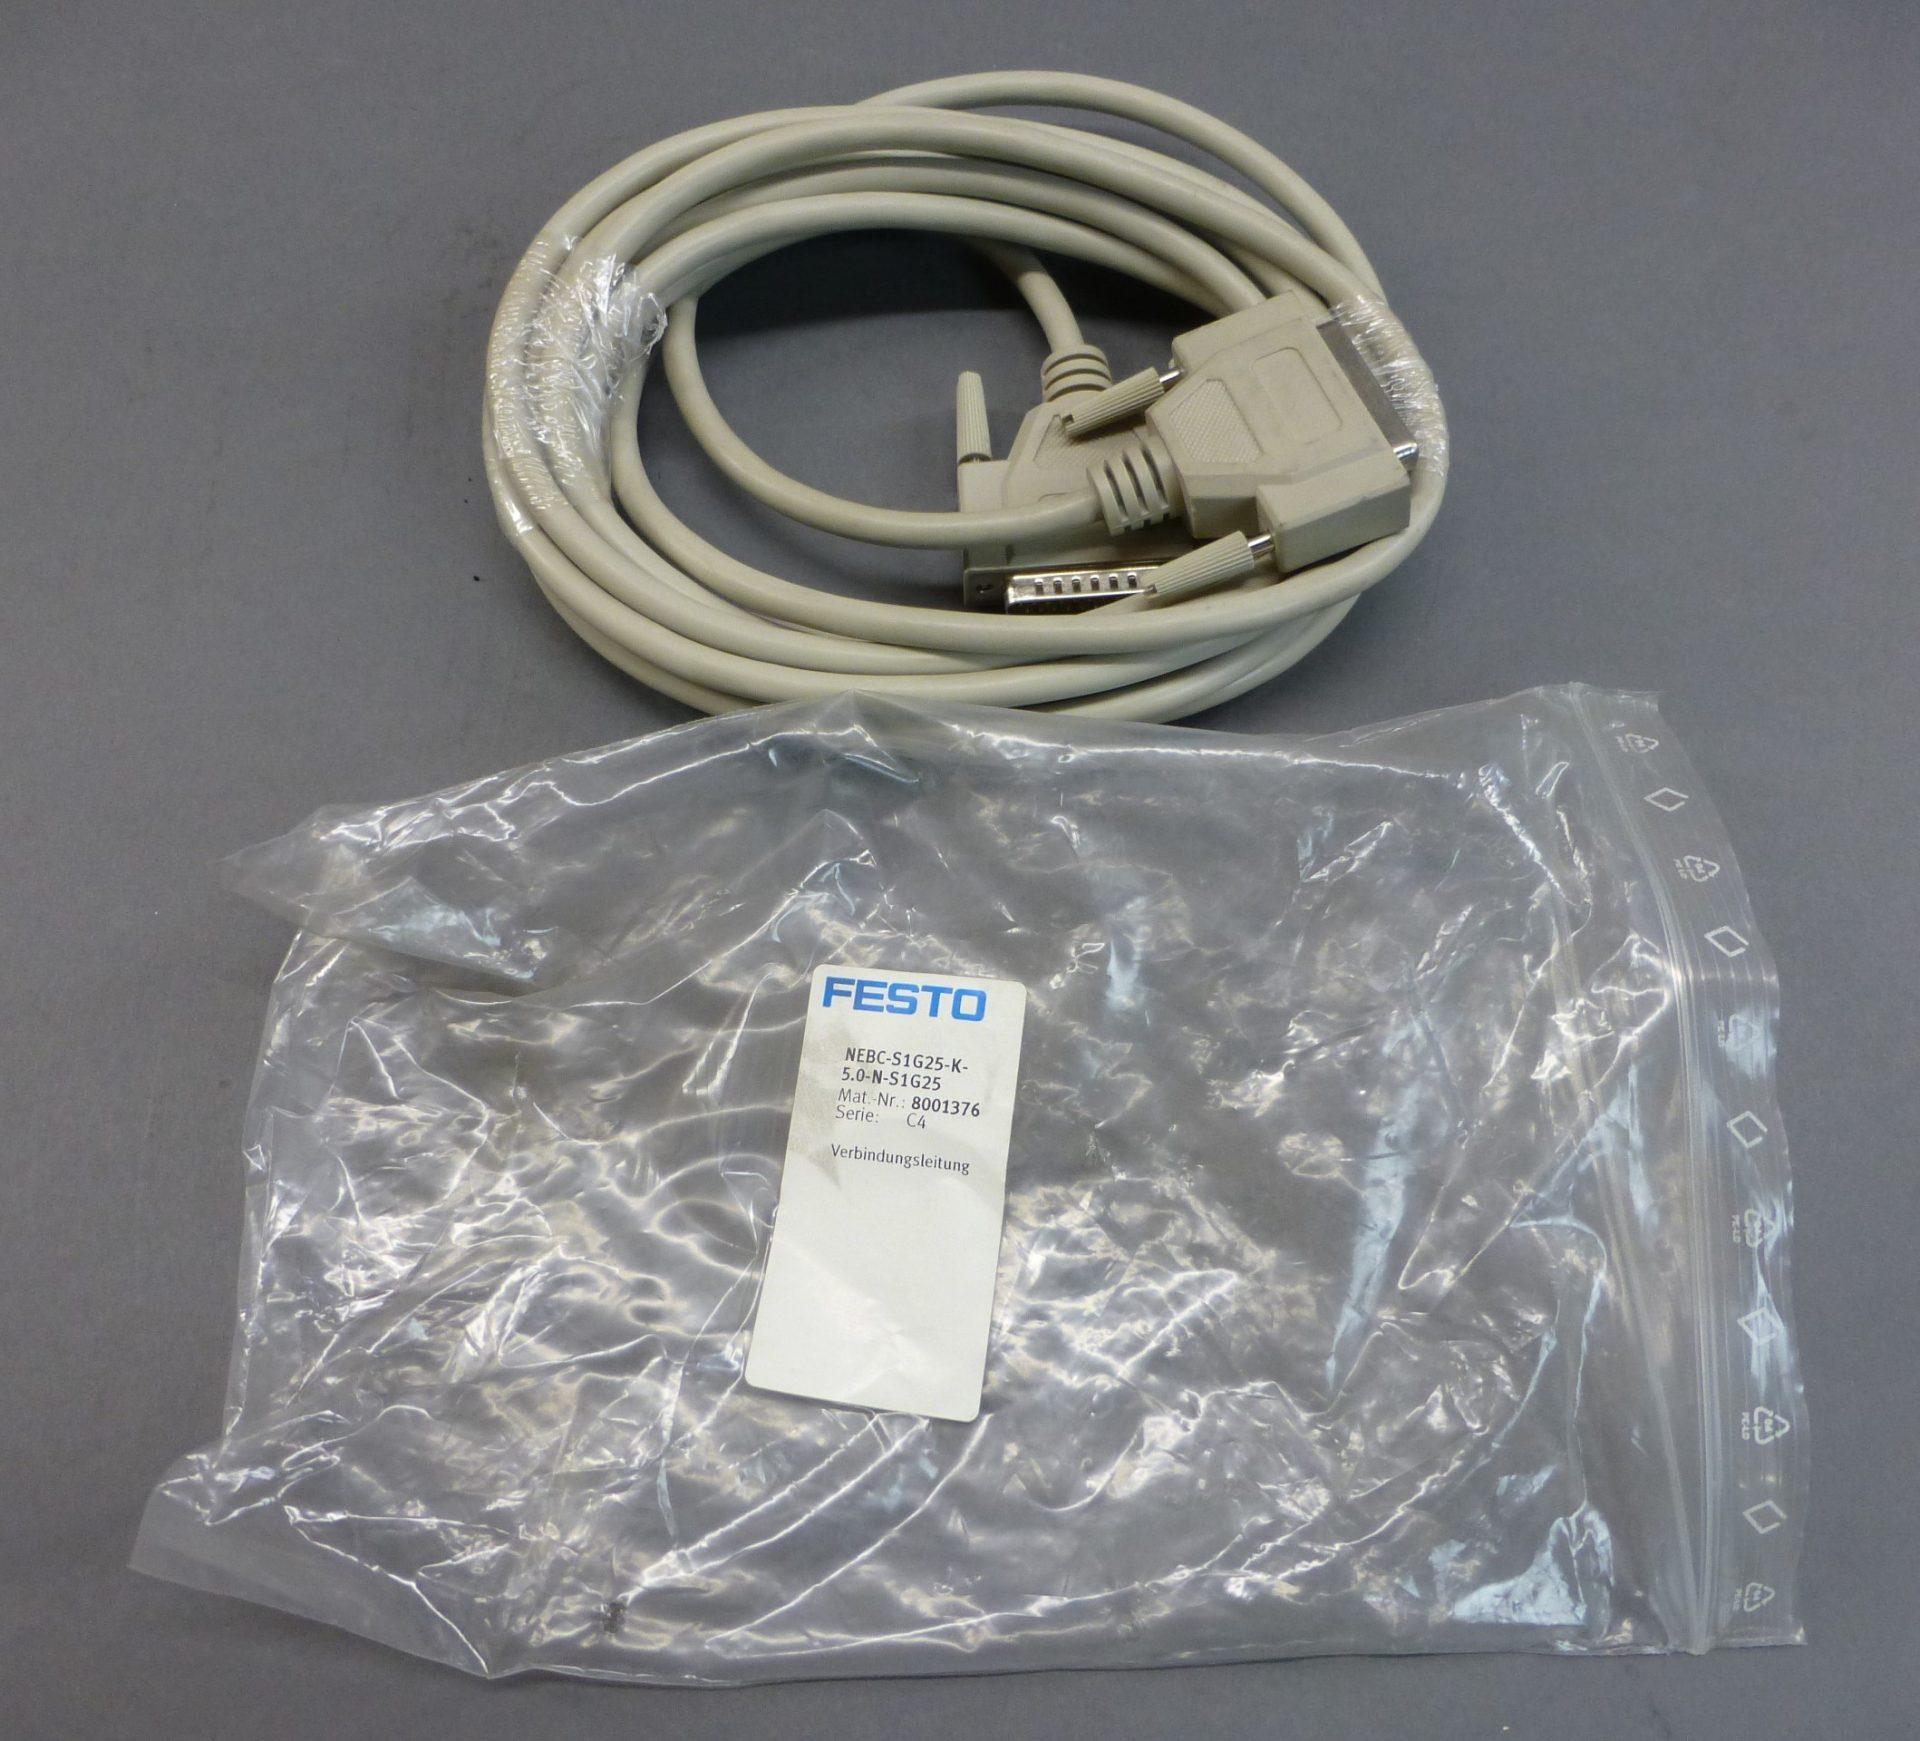 Festo NEBC-S1G25-K-5 0-N-S1G25 Cable, 8001376